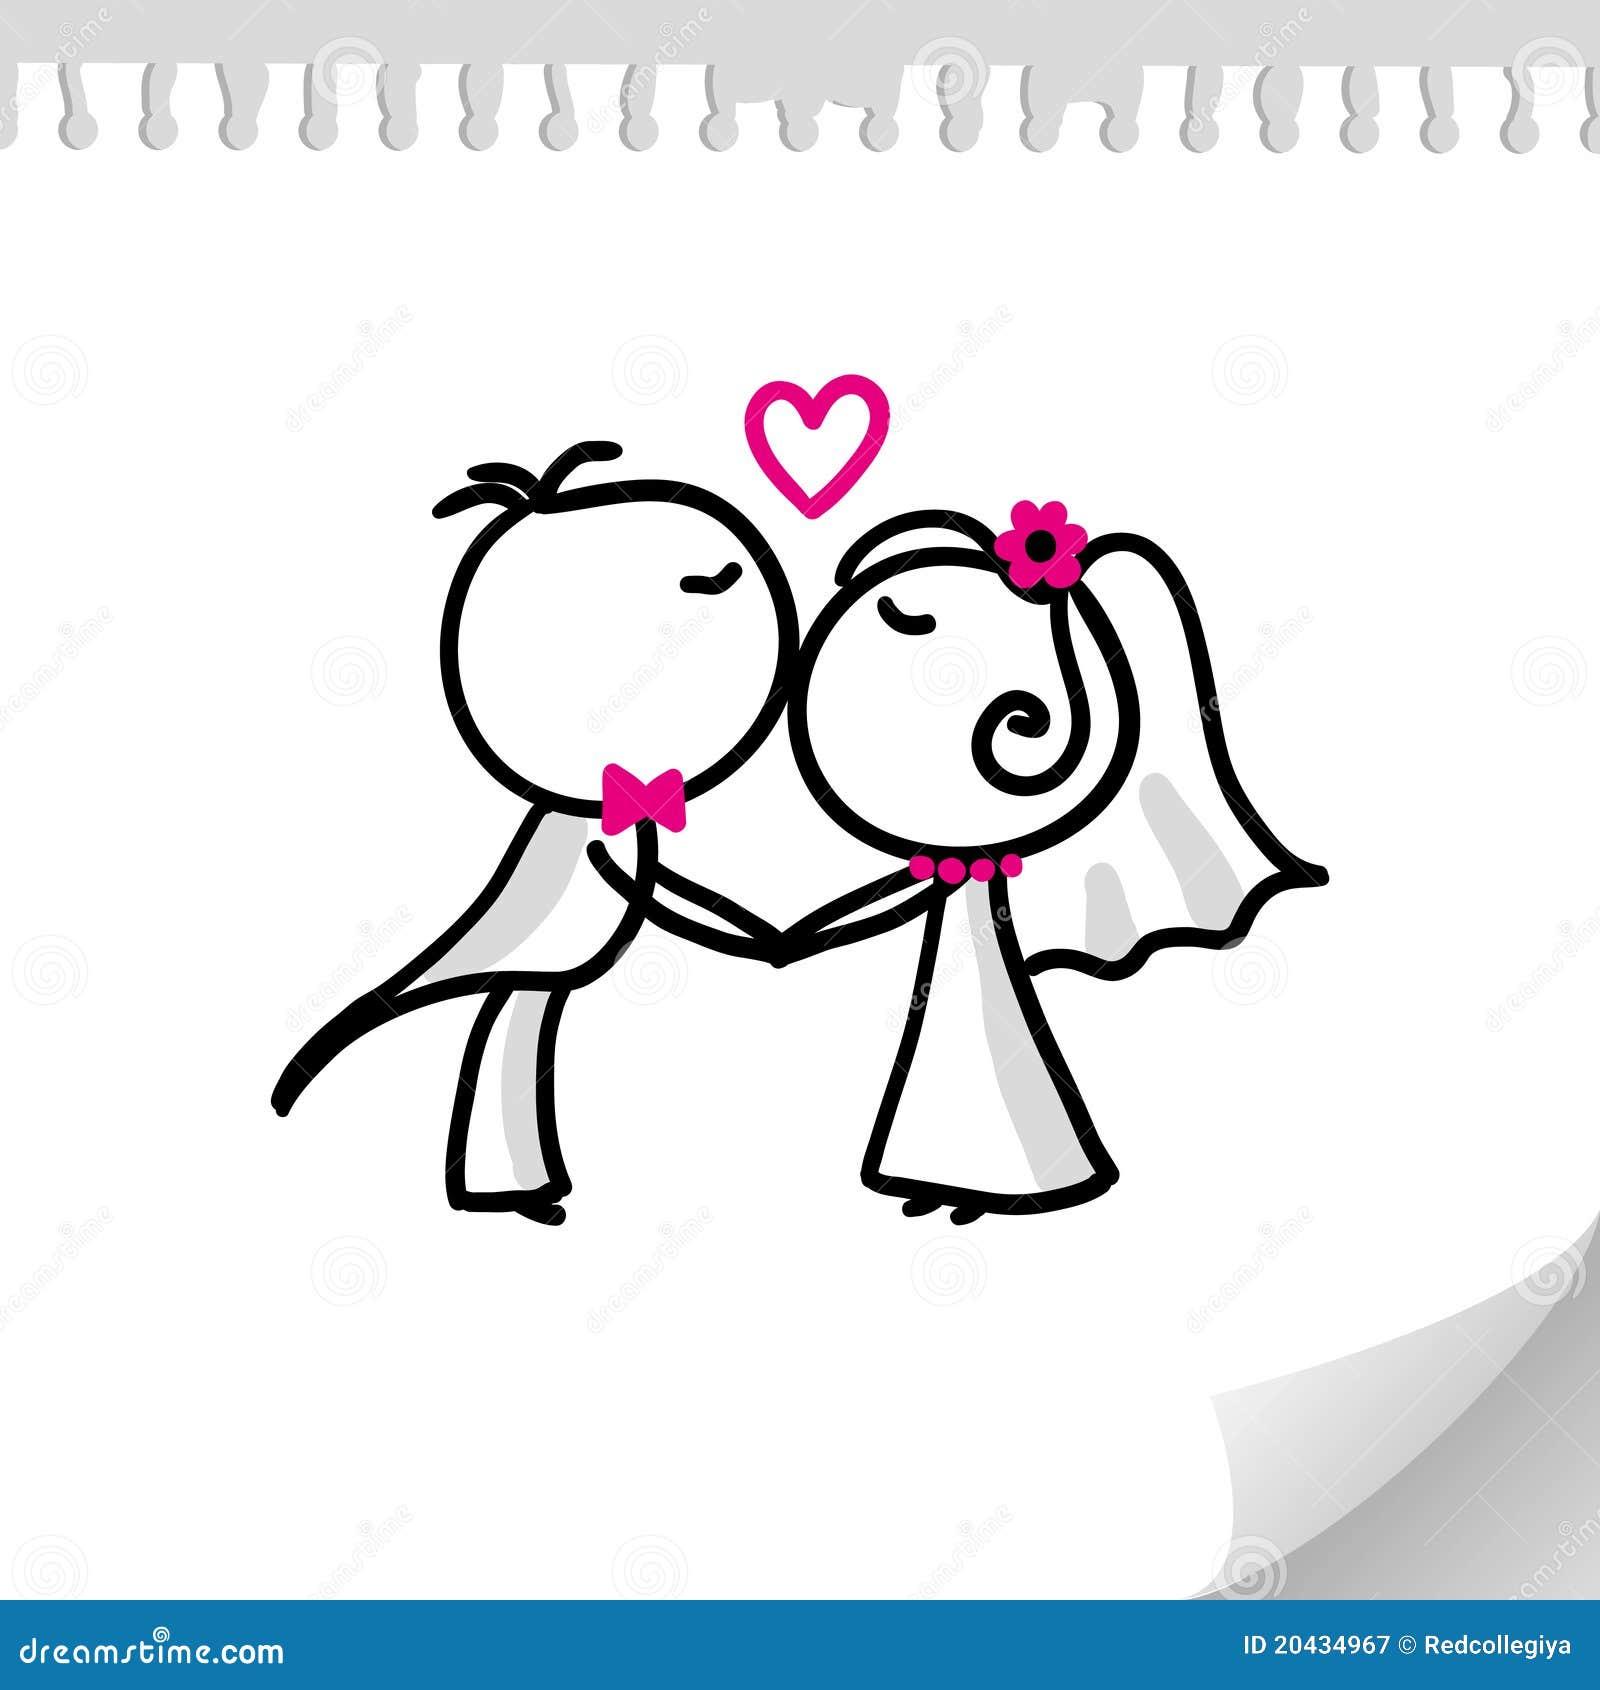 Wedding Couple Royalty Free Stock Photography - Image: 20434967